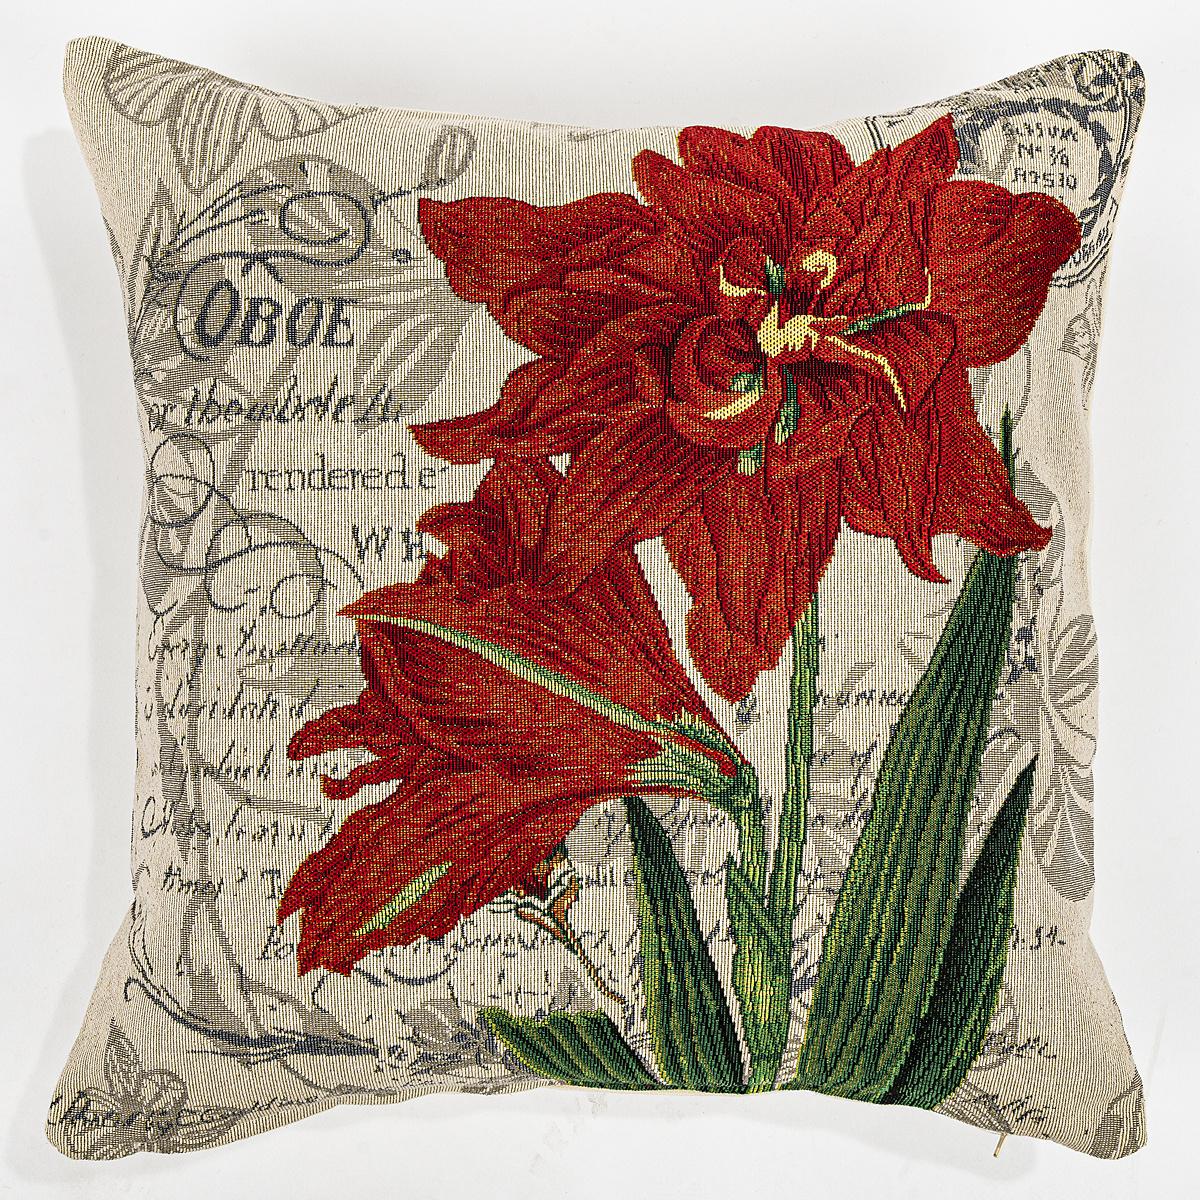 Boma Trading Povlak na polštářek Lilie červená, 45 x 45 cm